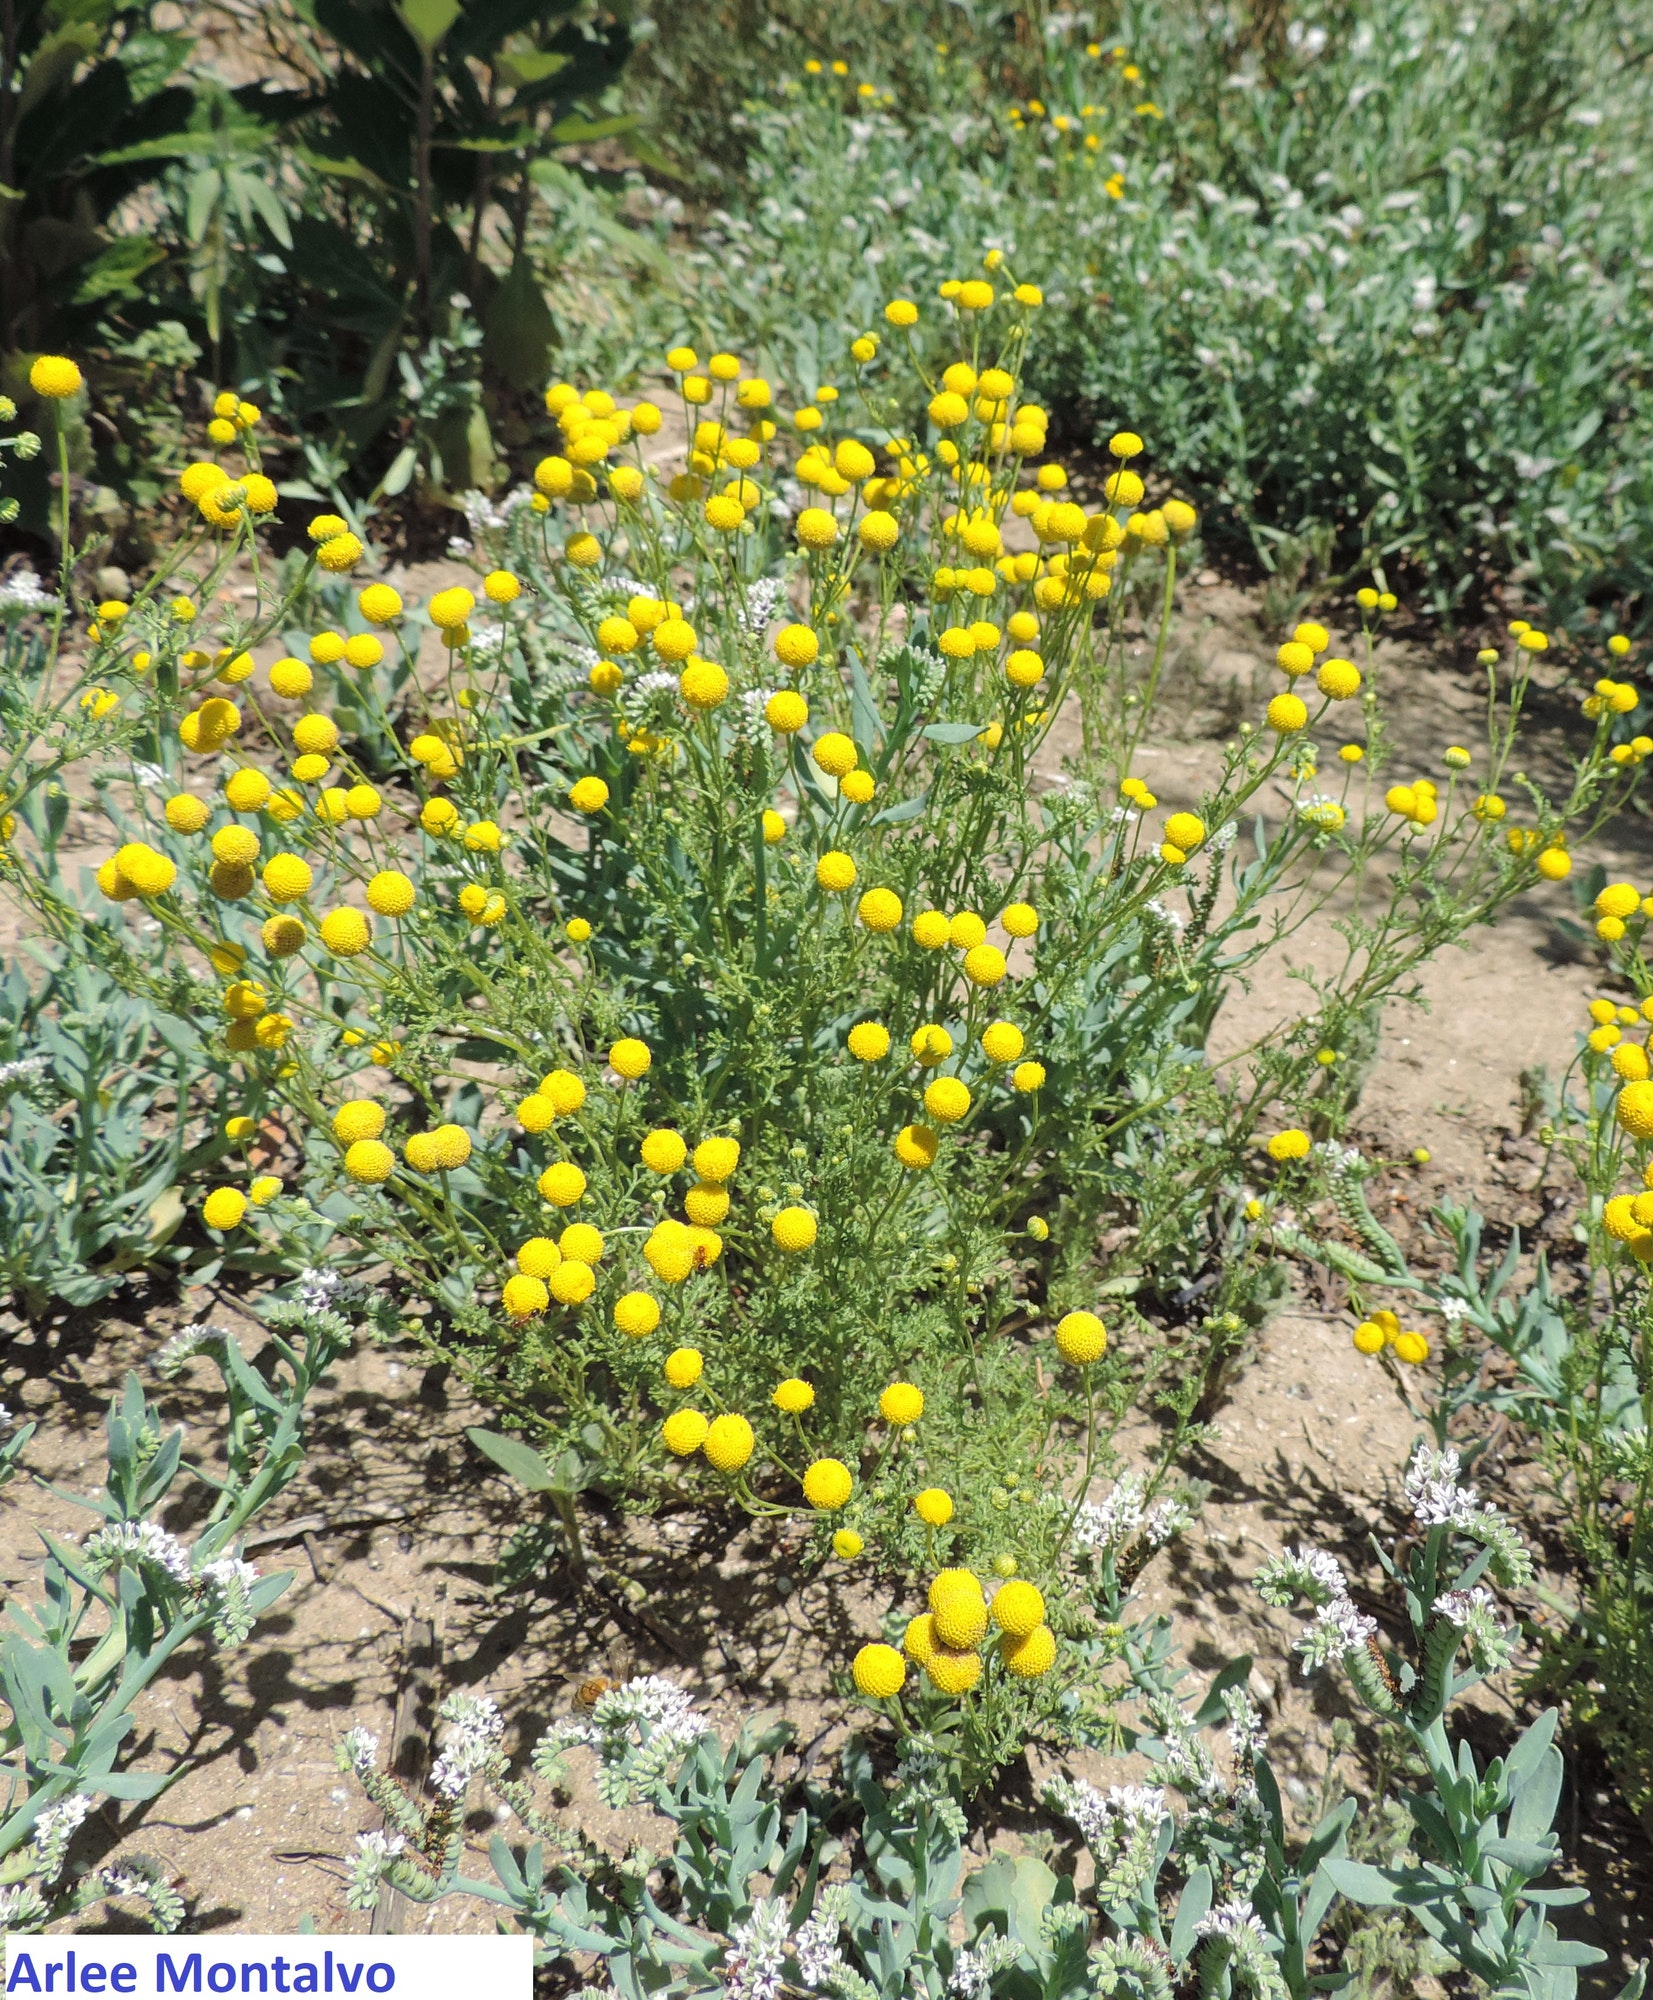 Stinknet (Oncosiphon piluliferum) plant